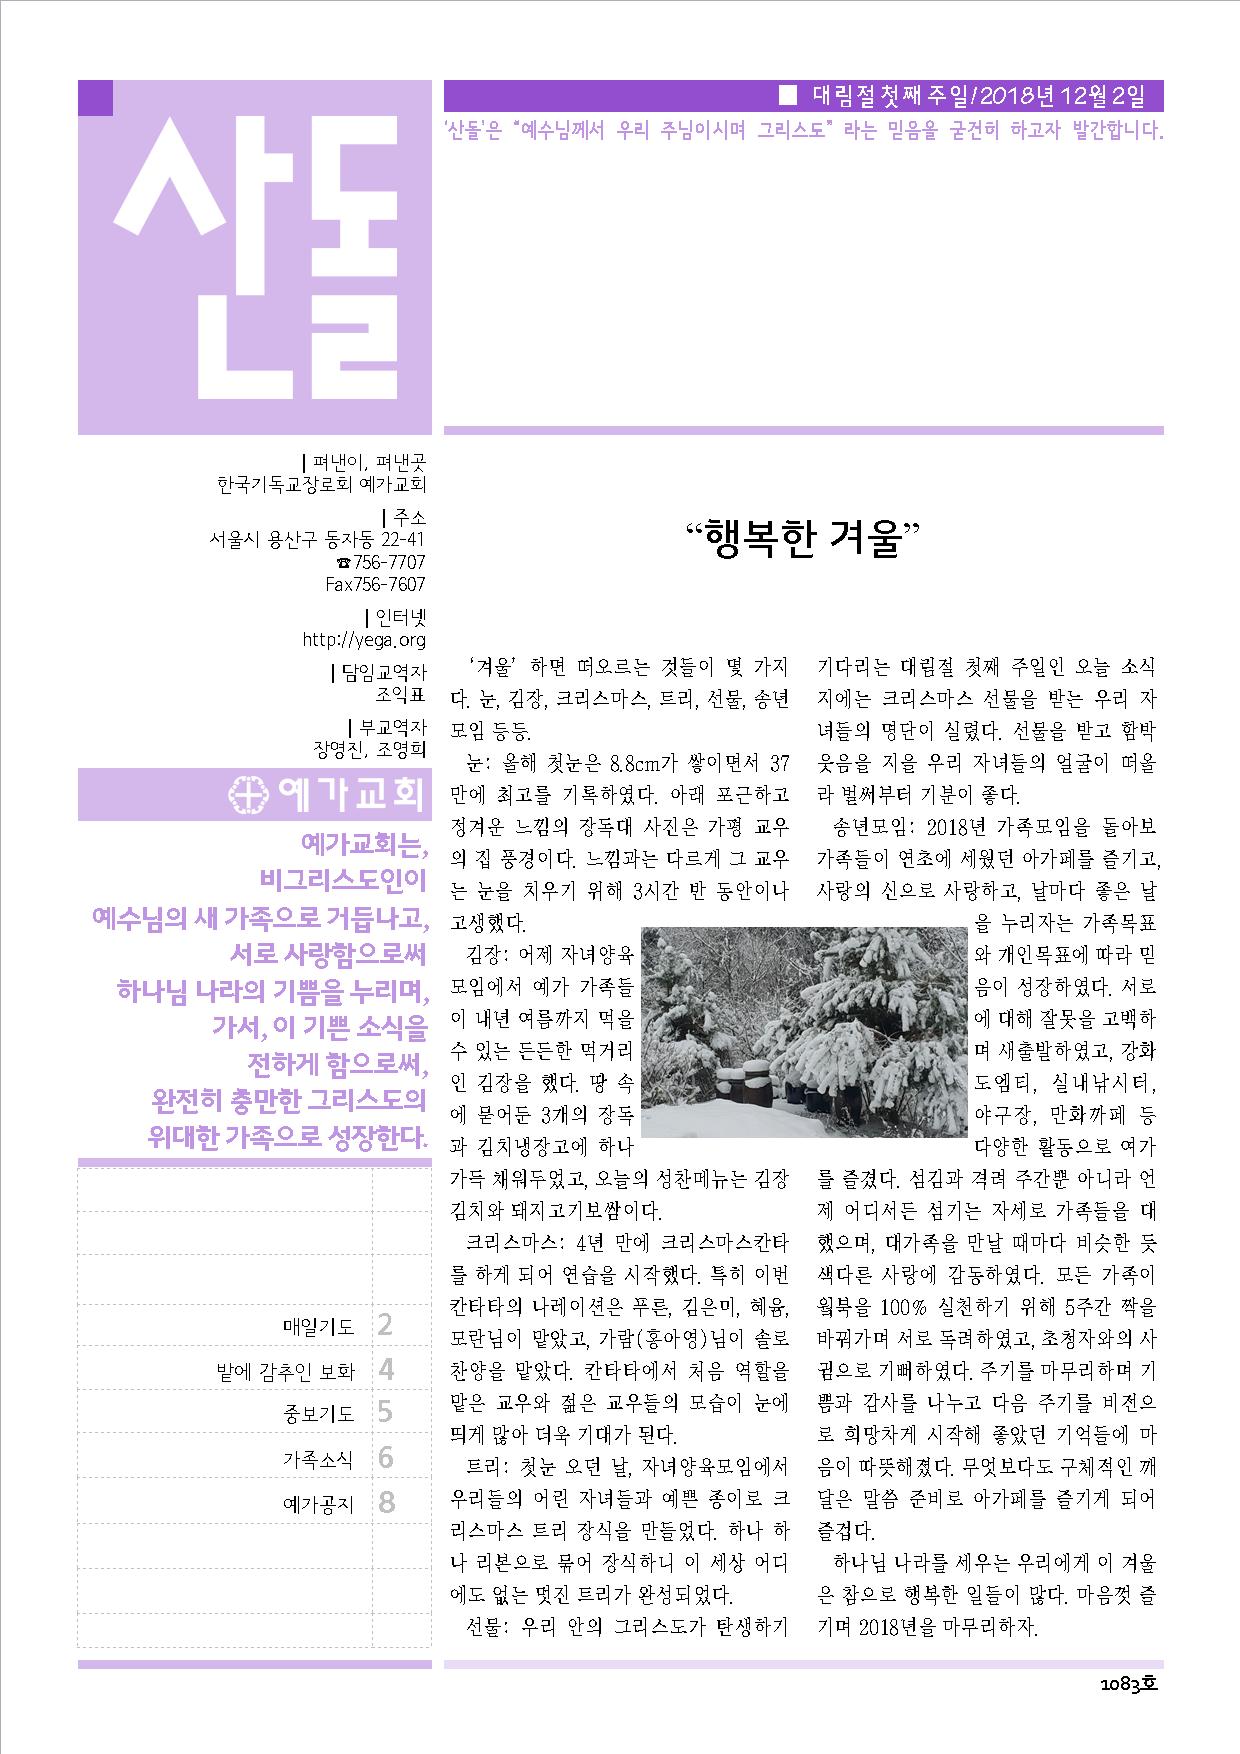 18sdjb1202_페이지_1.png